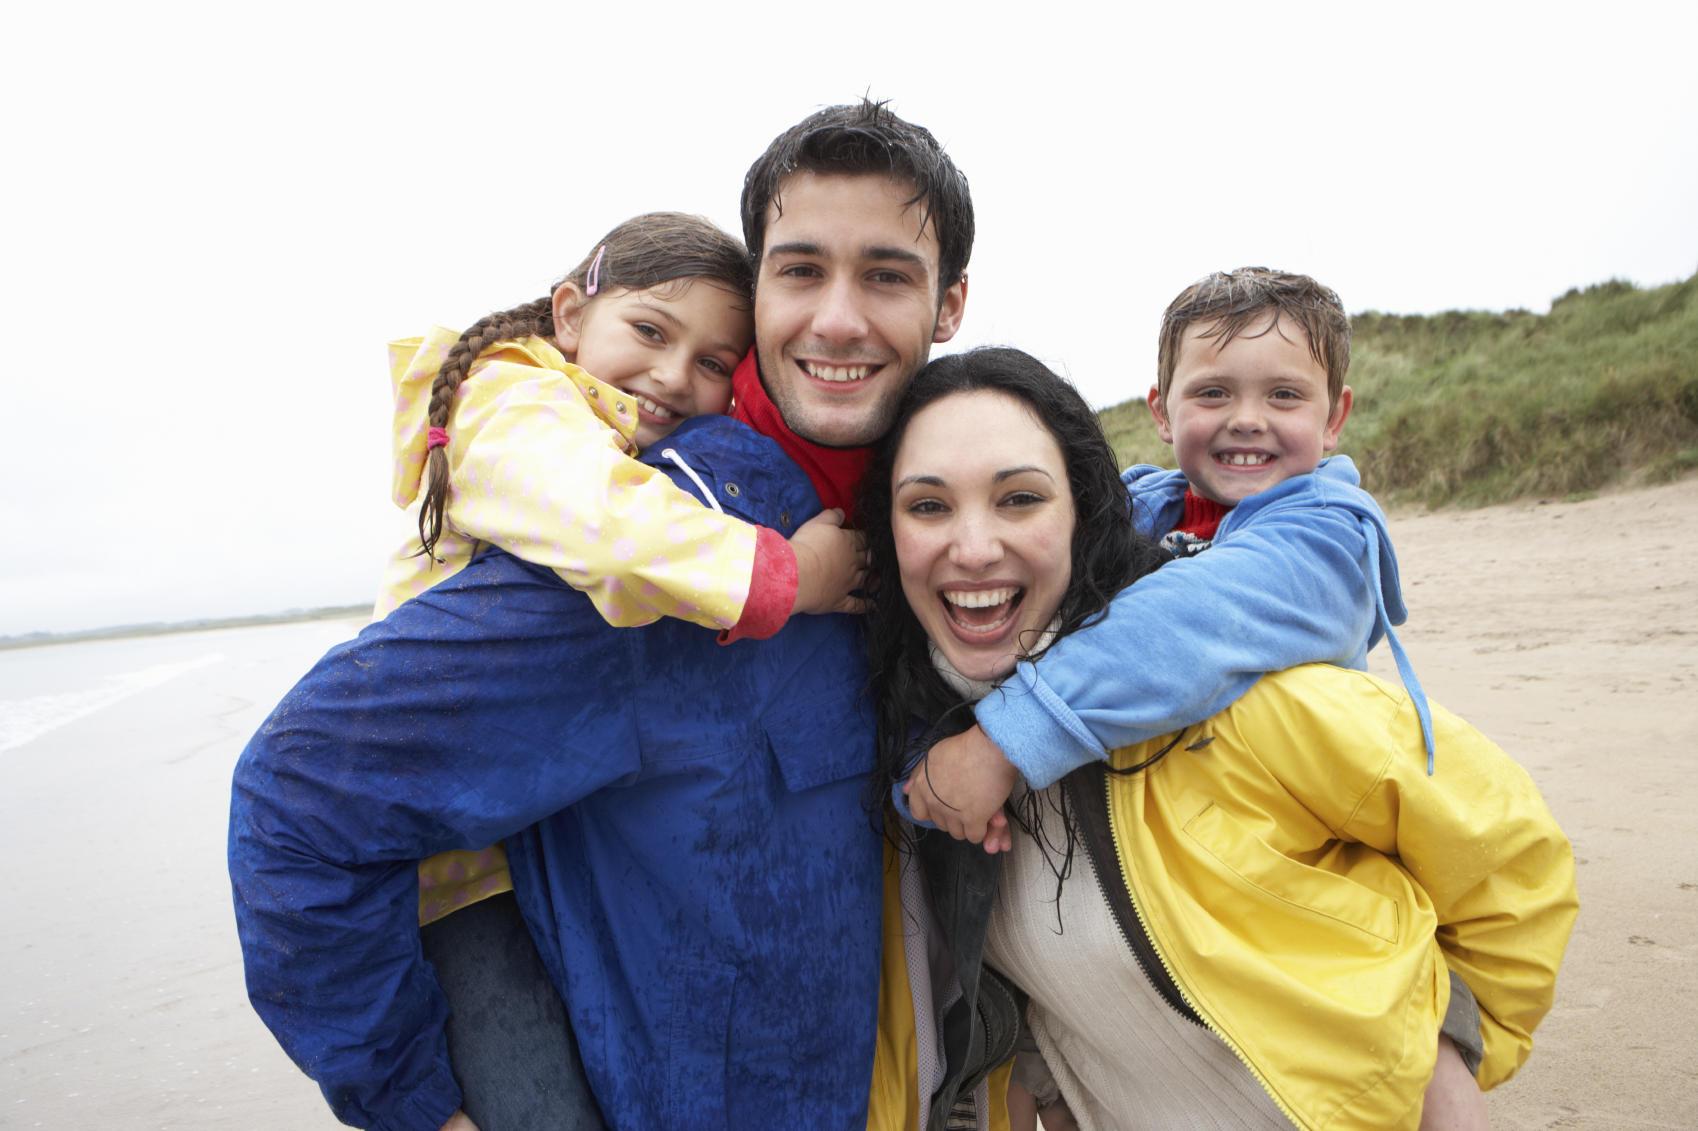 happy family on a beach